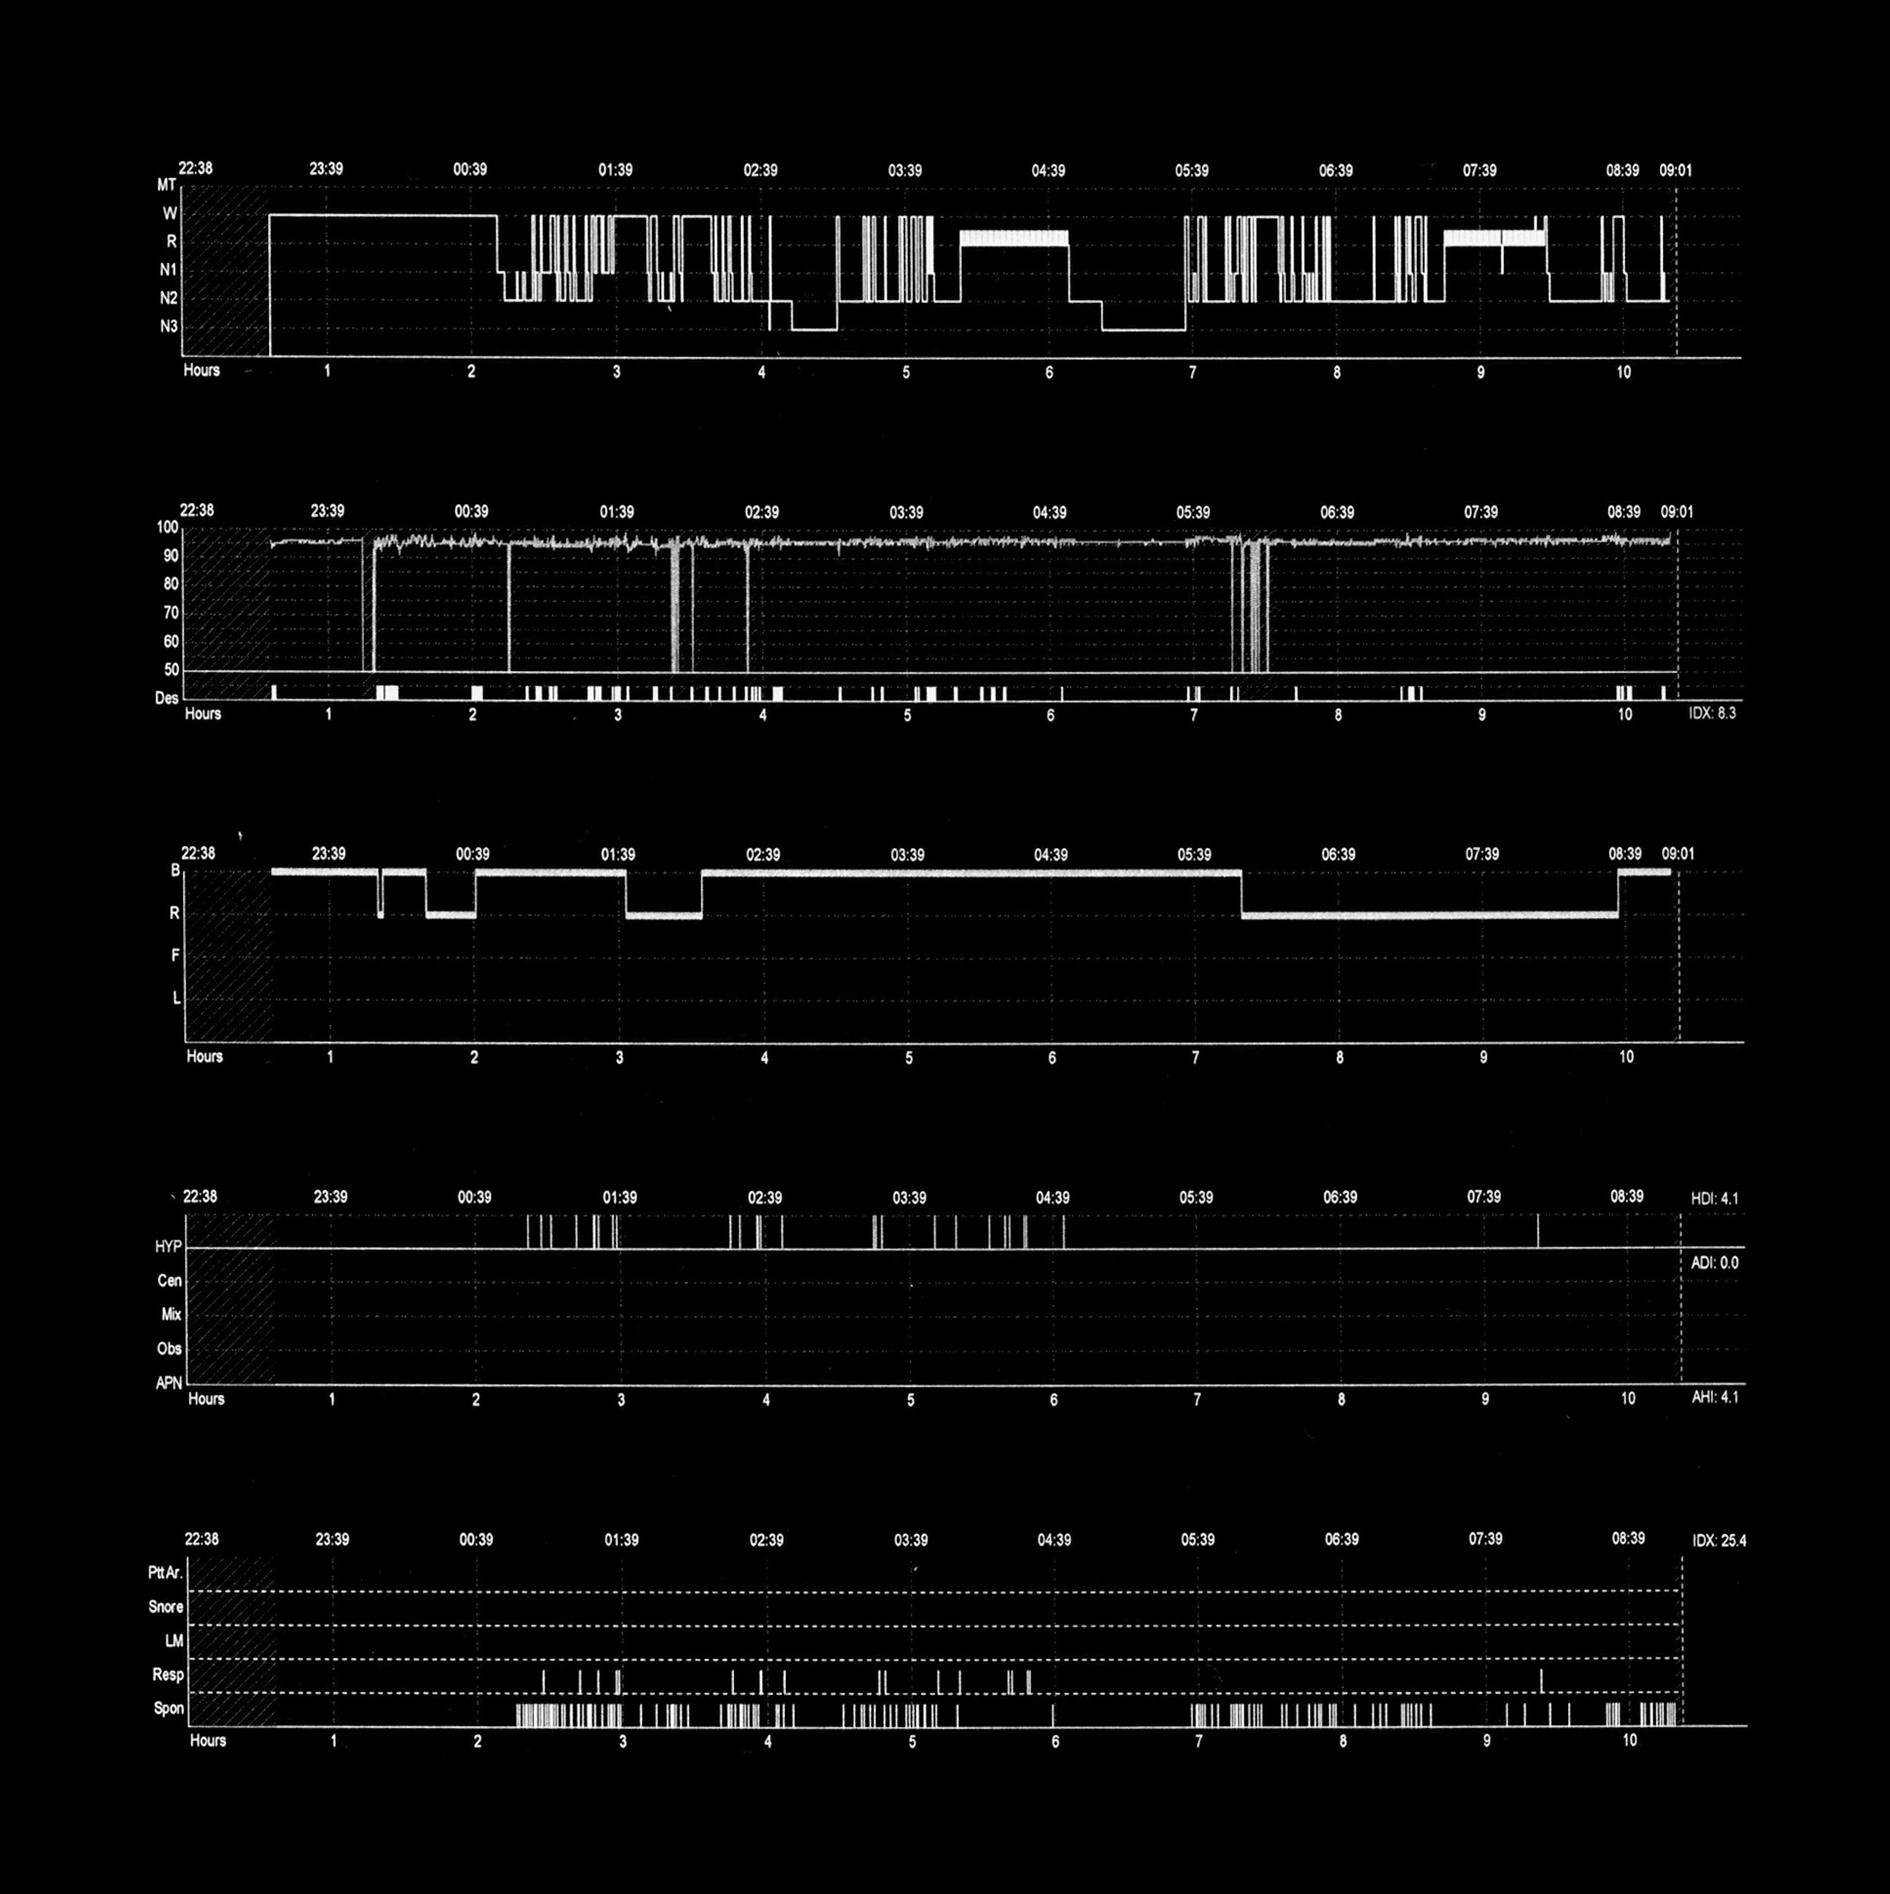 eh86-insert.jpg